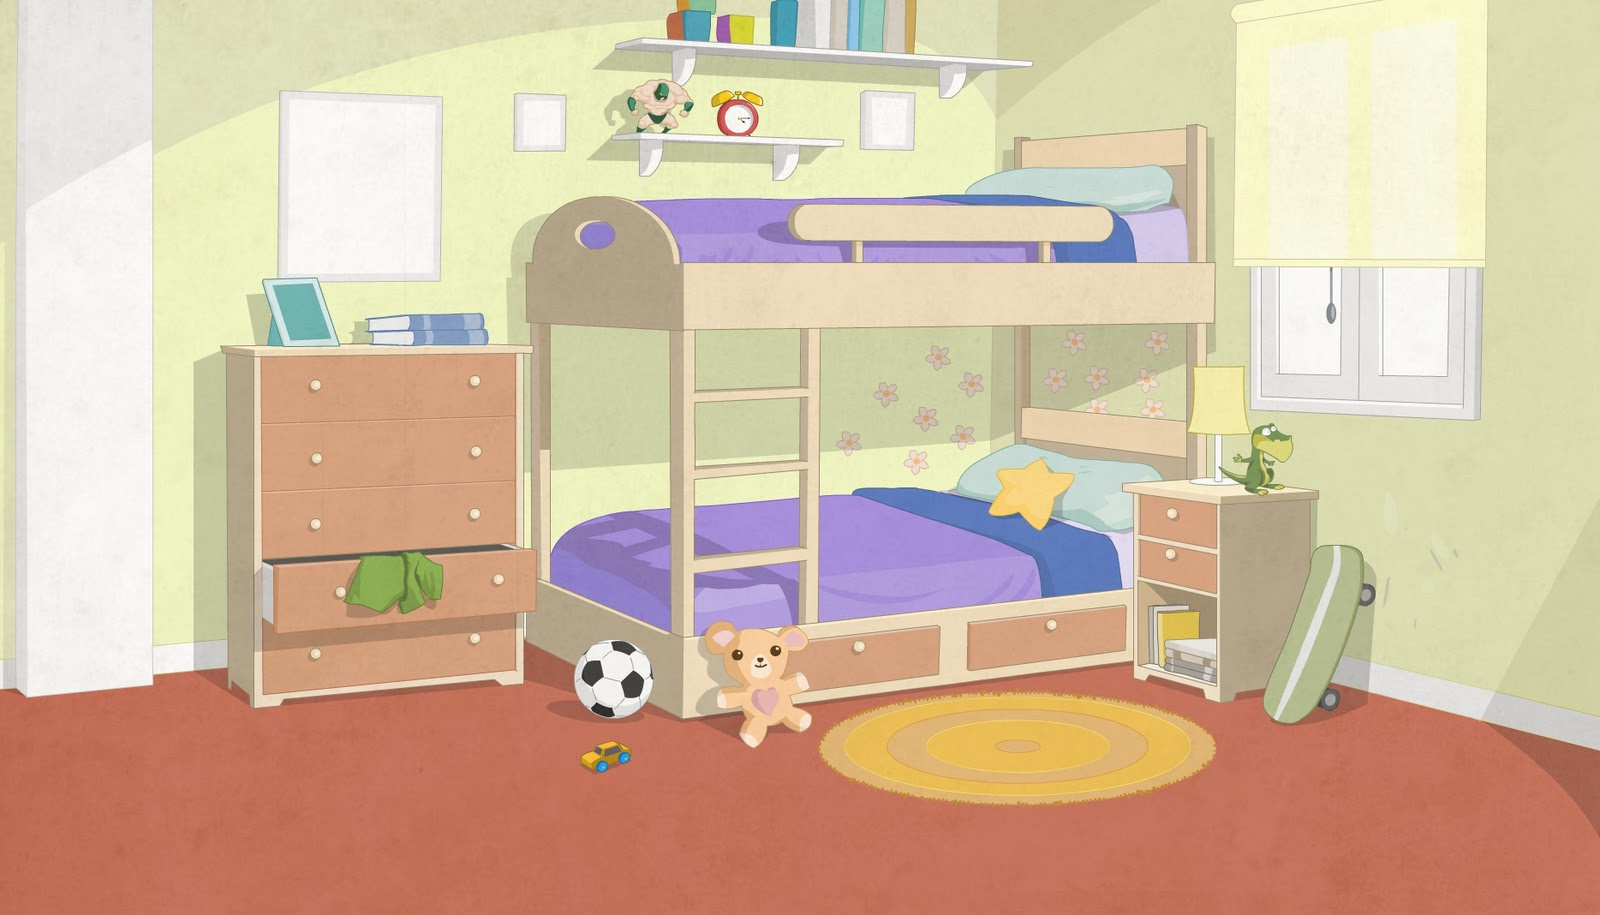 Mansilla ilustraciones - Dibujos habitaciones infantiles ...